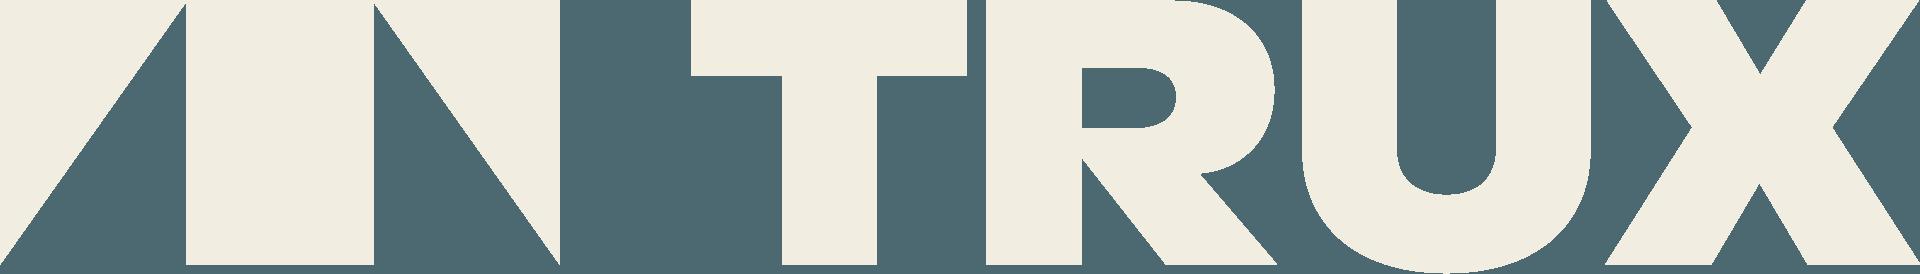 TRUX_RGB_Brandmark_Reversed